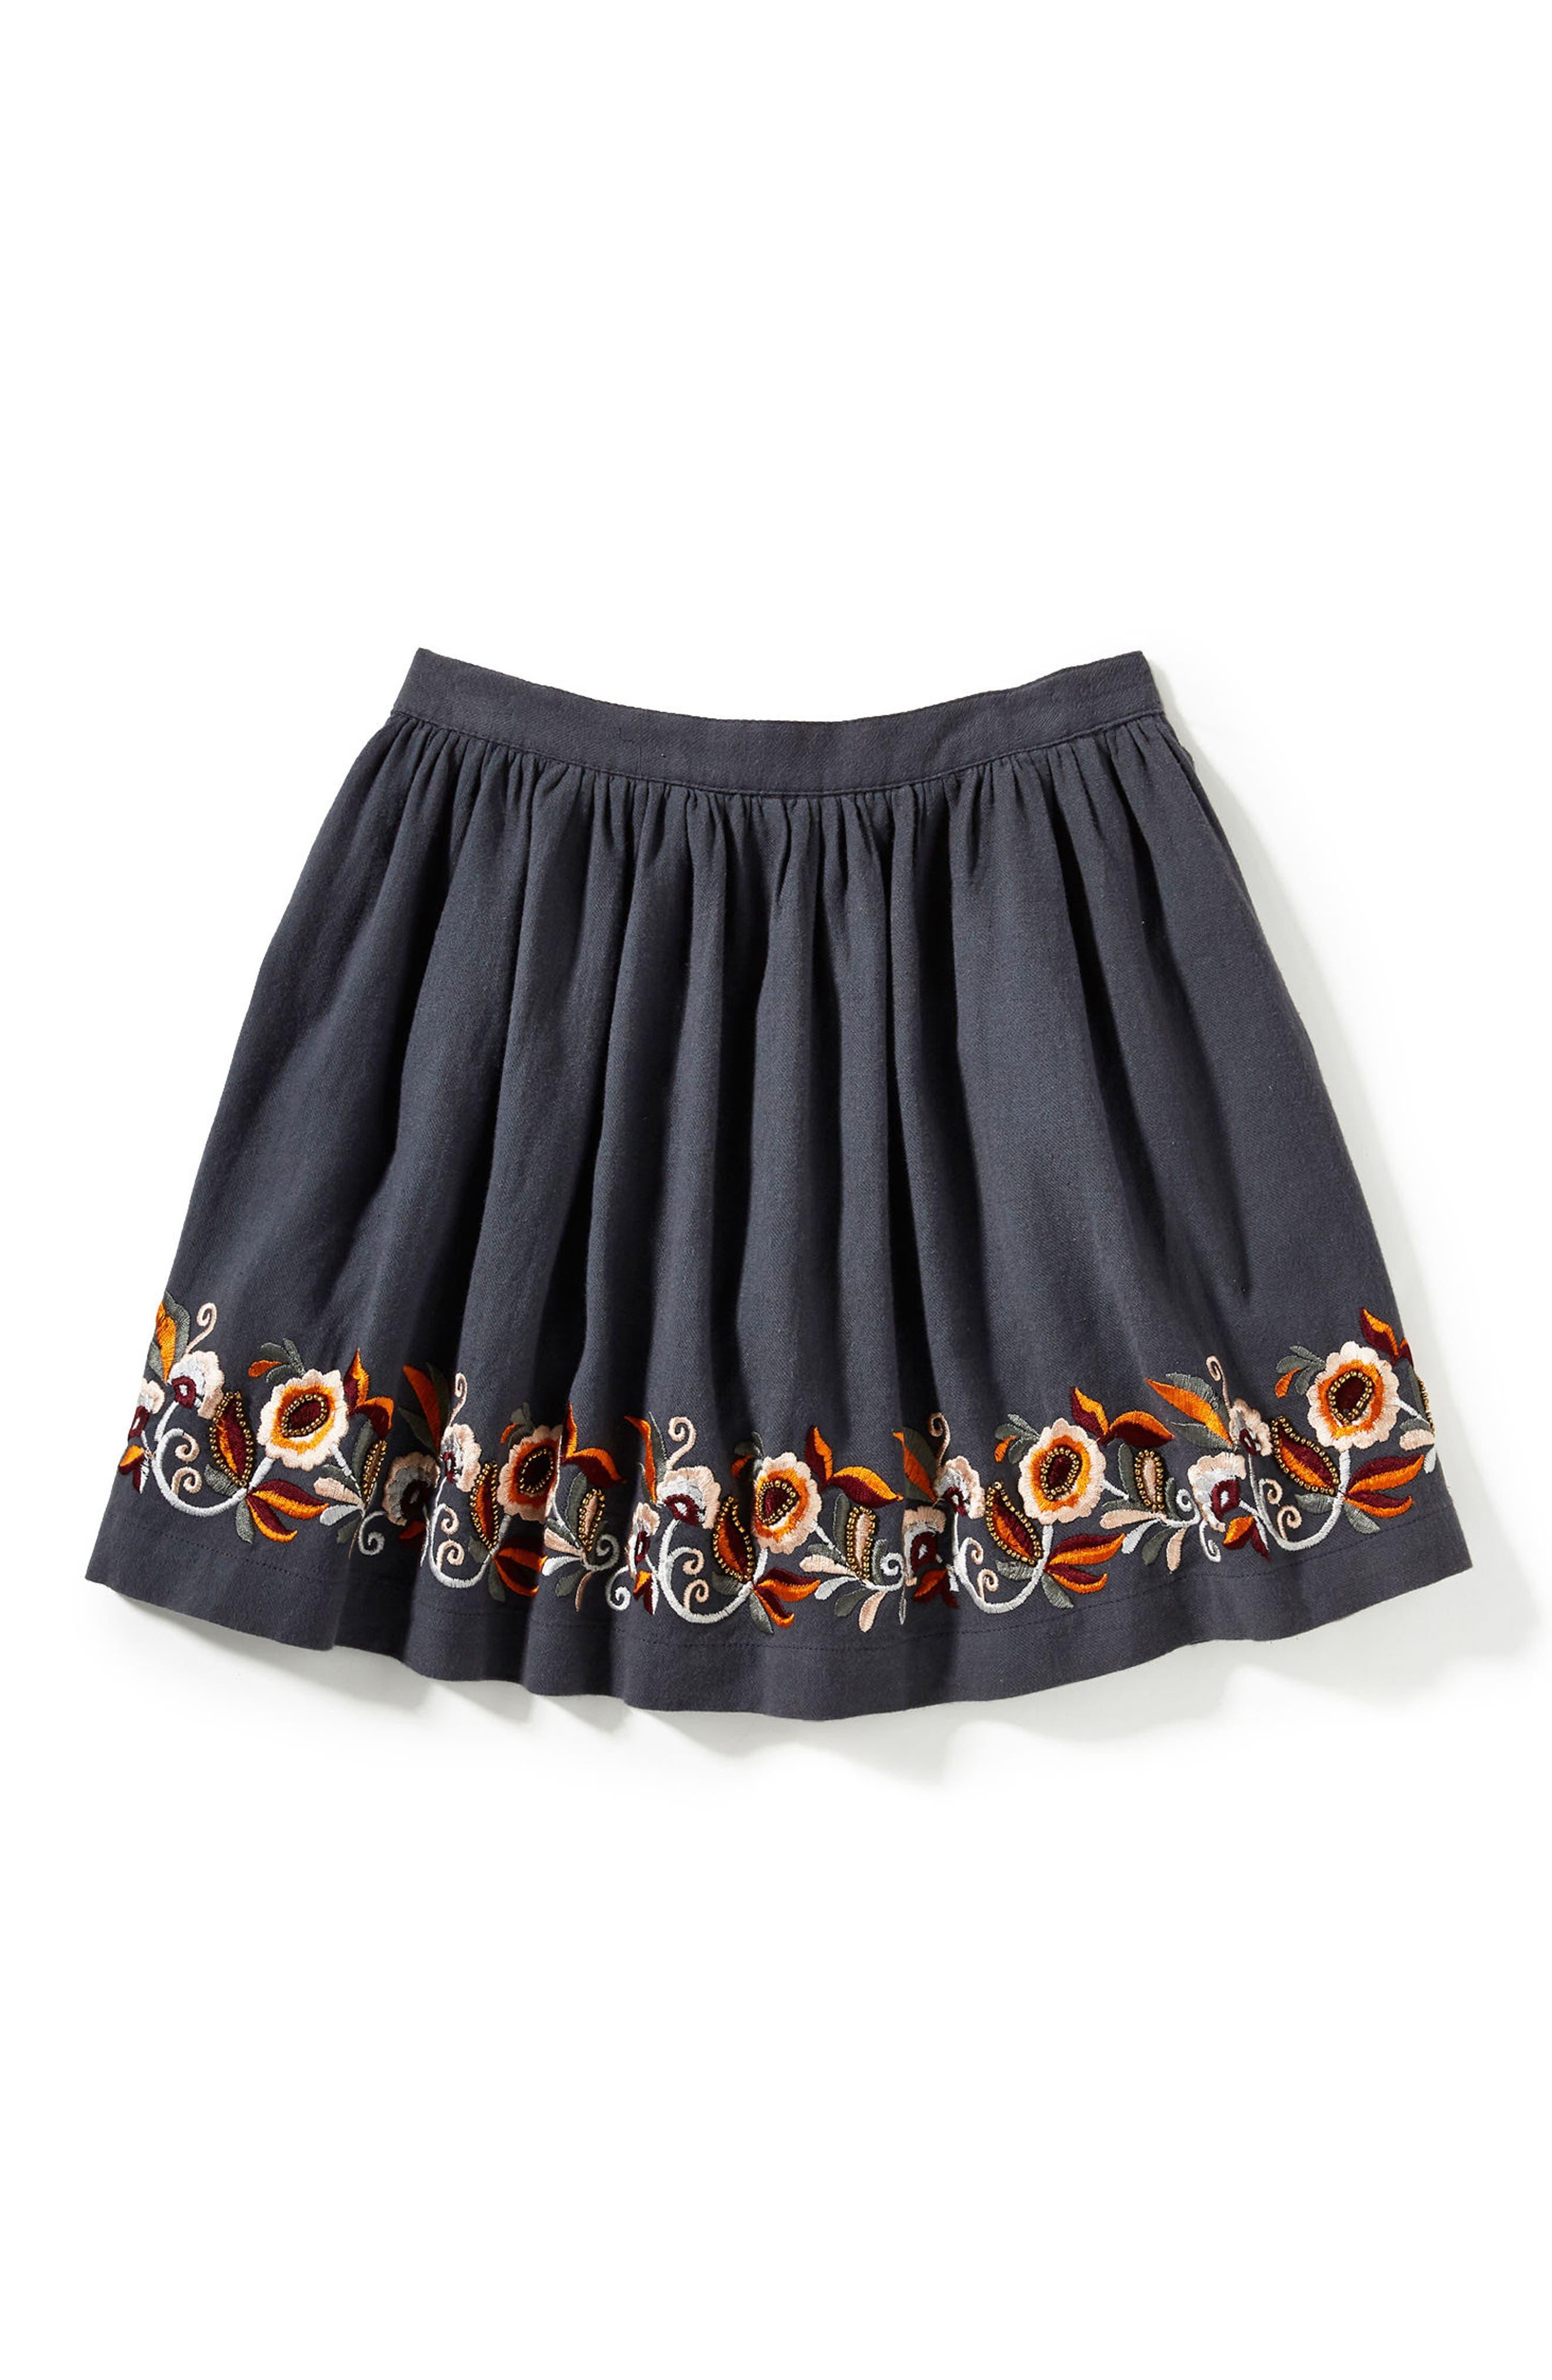 Alternate Image 1 Selected - Peek Claire Embroidered Skirt (Toddler Girls, Little Girls & Big Girls)